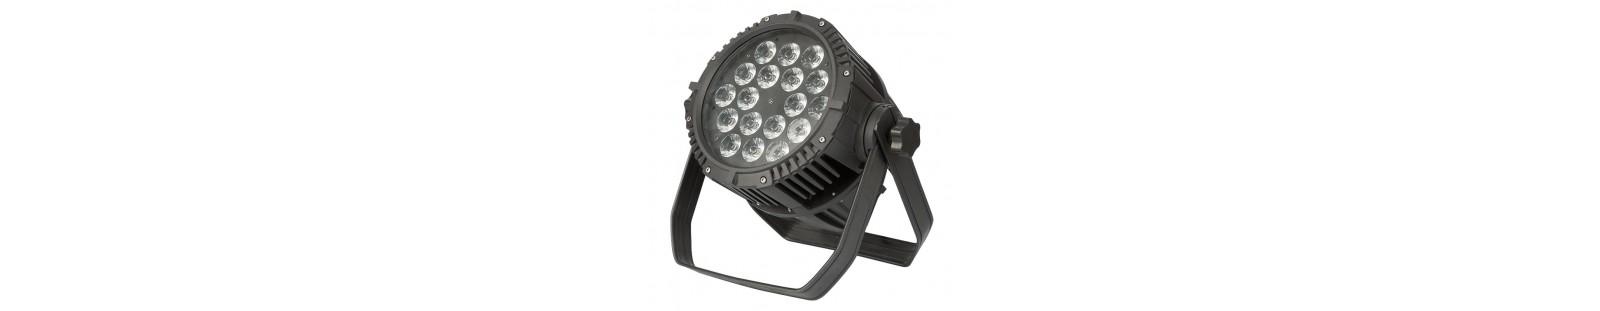 KZ-LED1810 waterproof Par